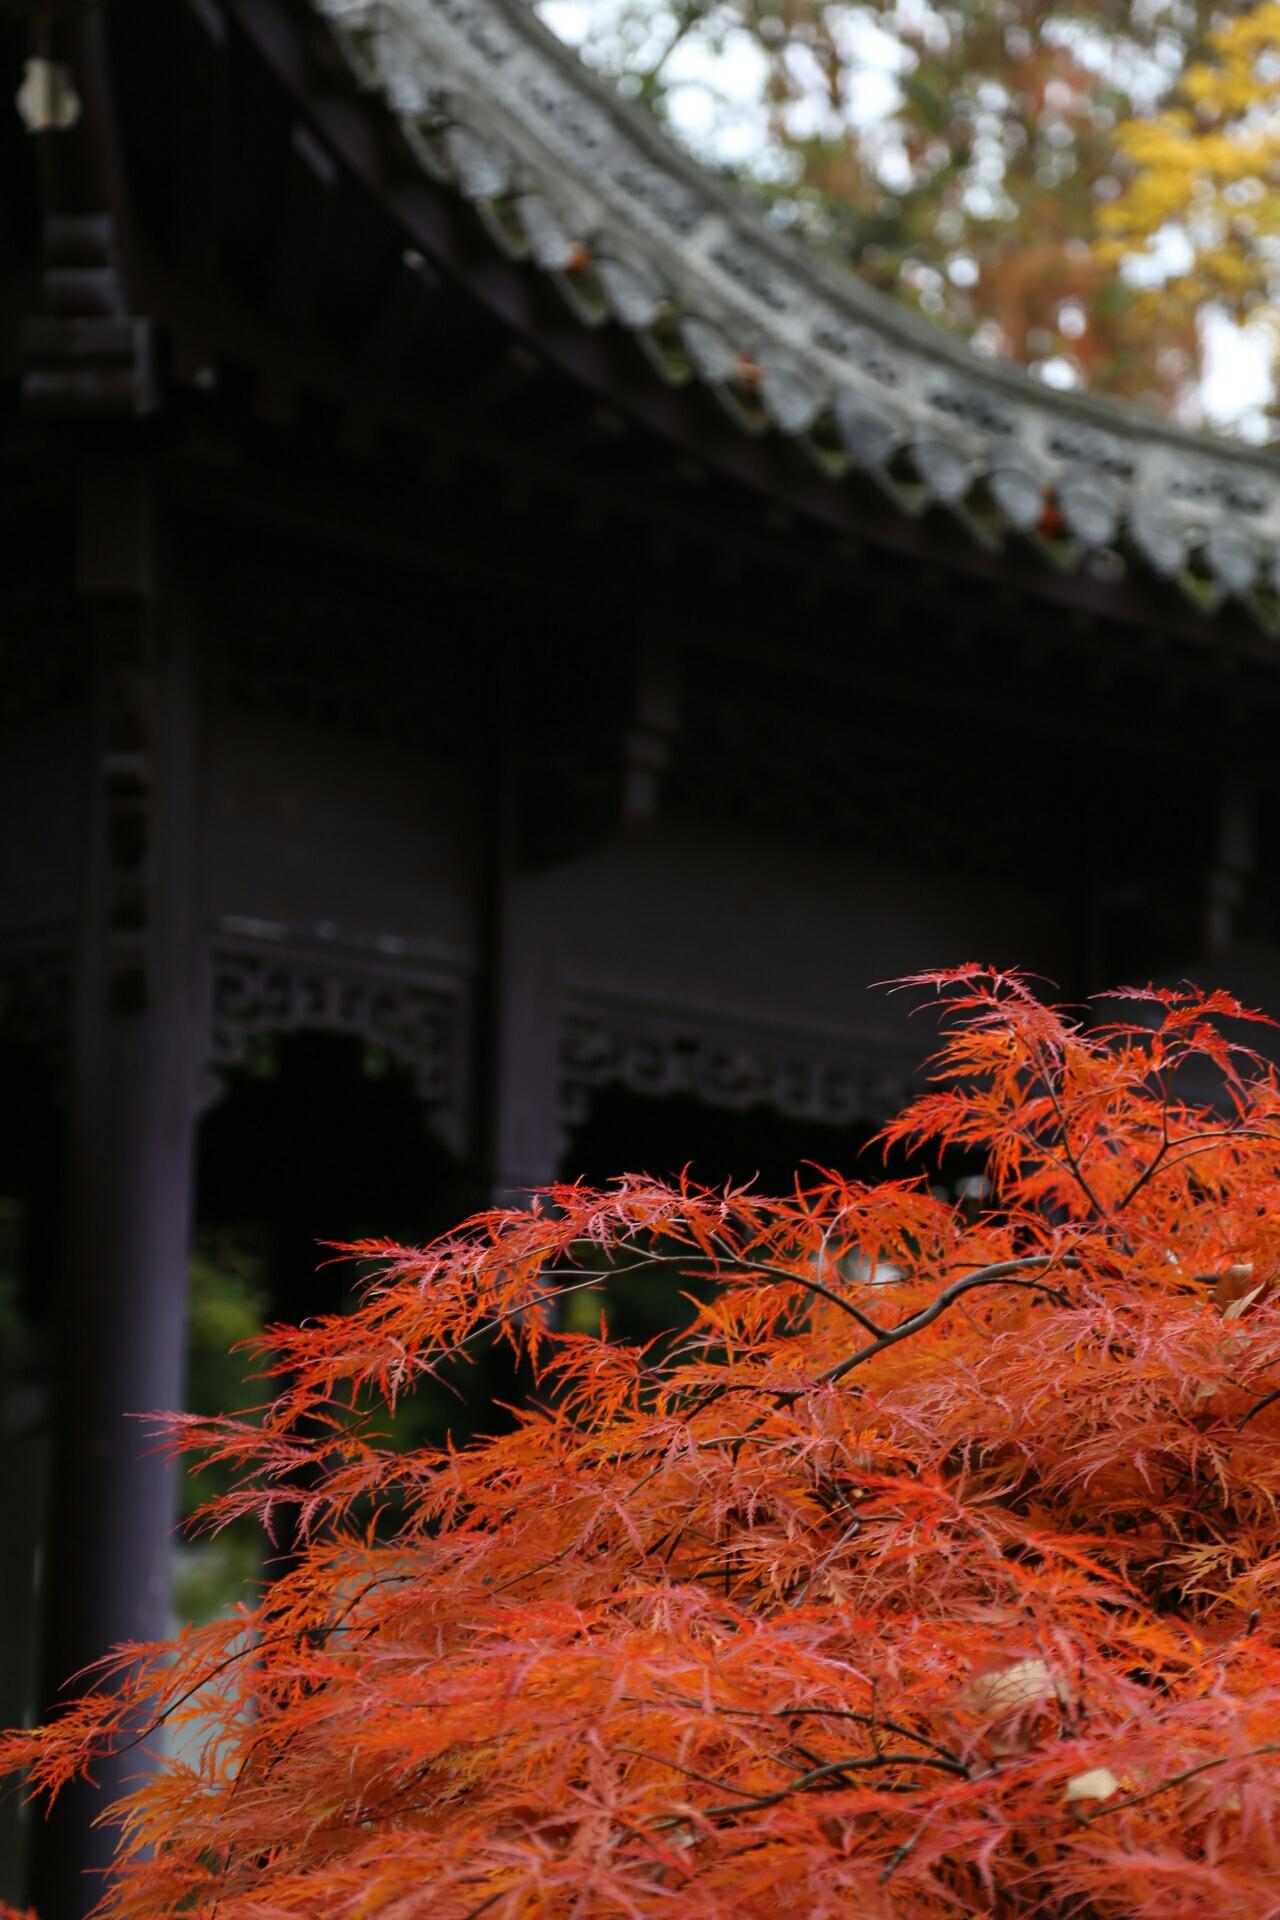 Autumn in the Chinese garden